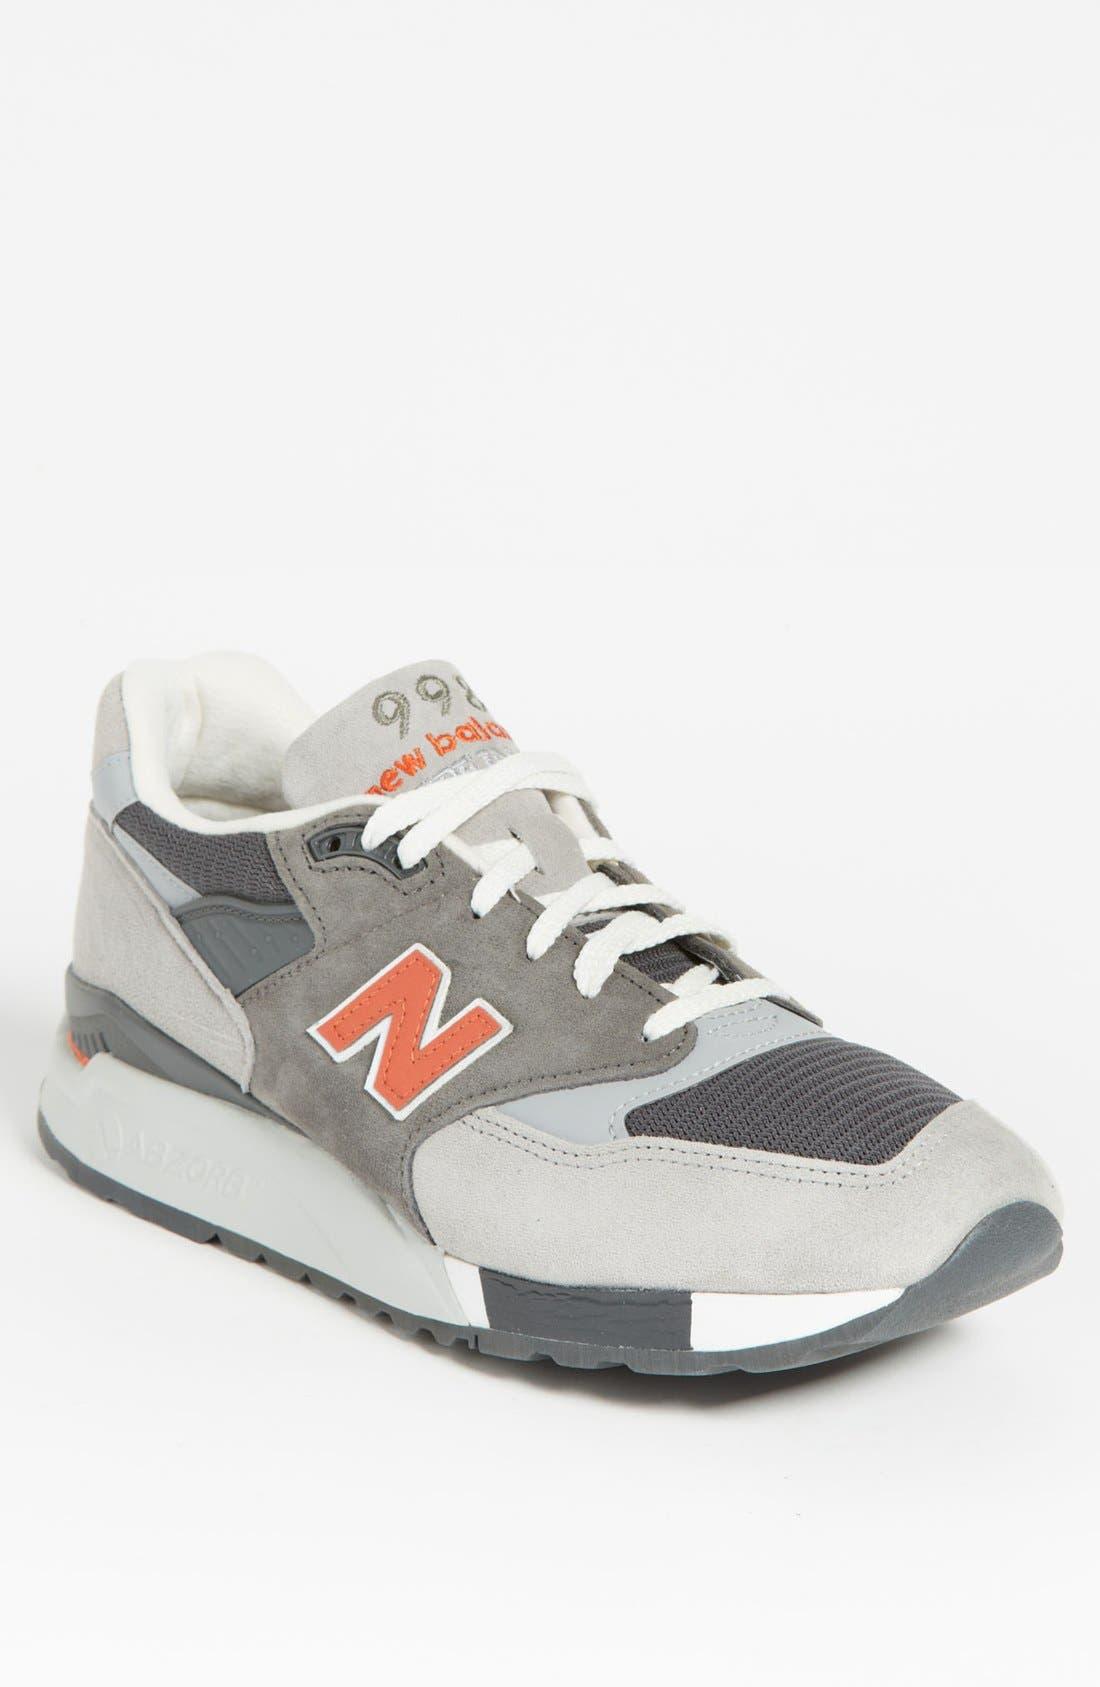 Main Image - New Balance '998' Sneaker (Men)